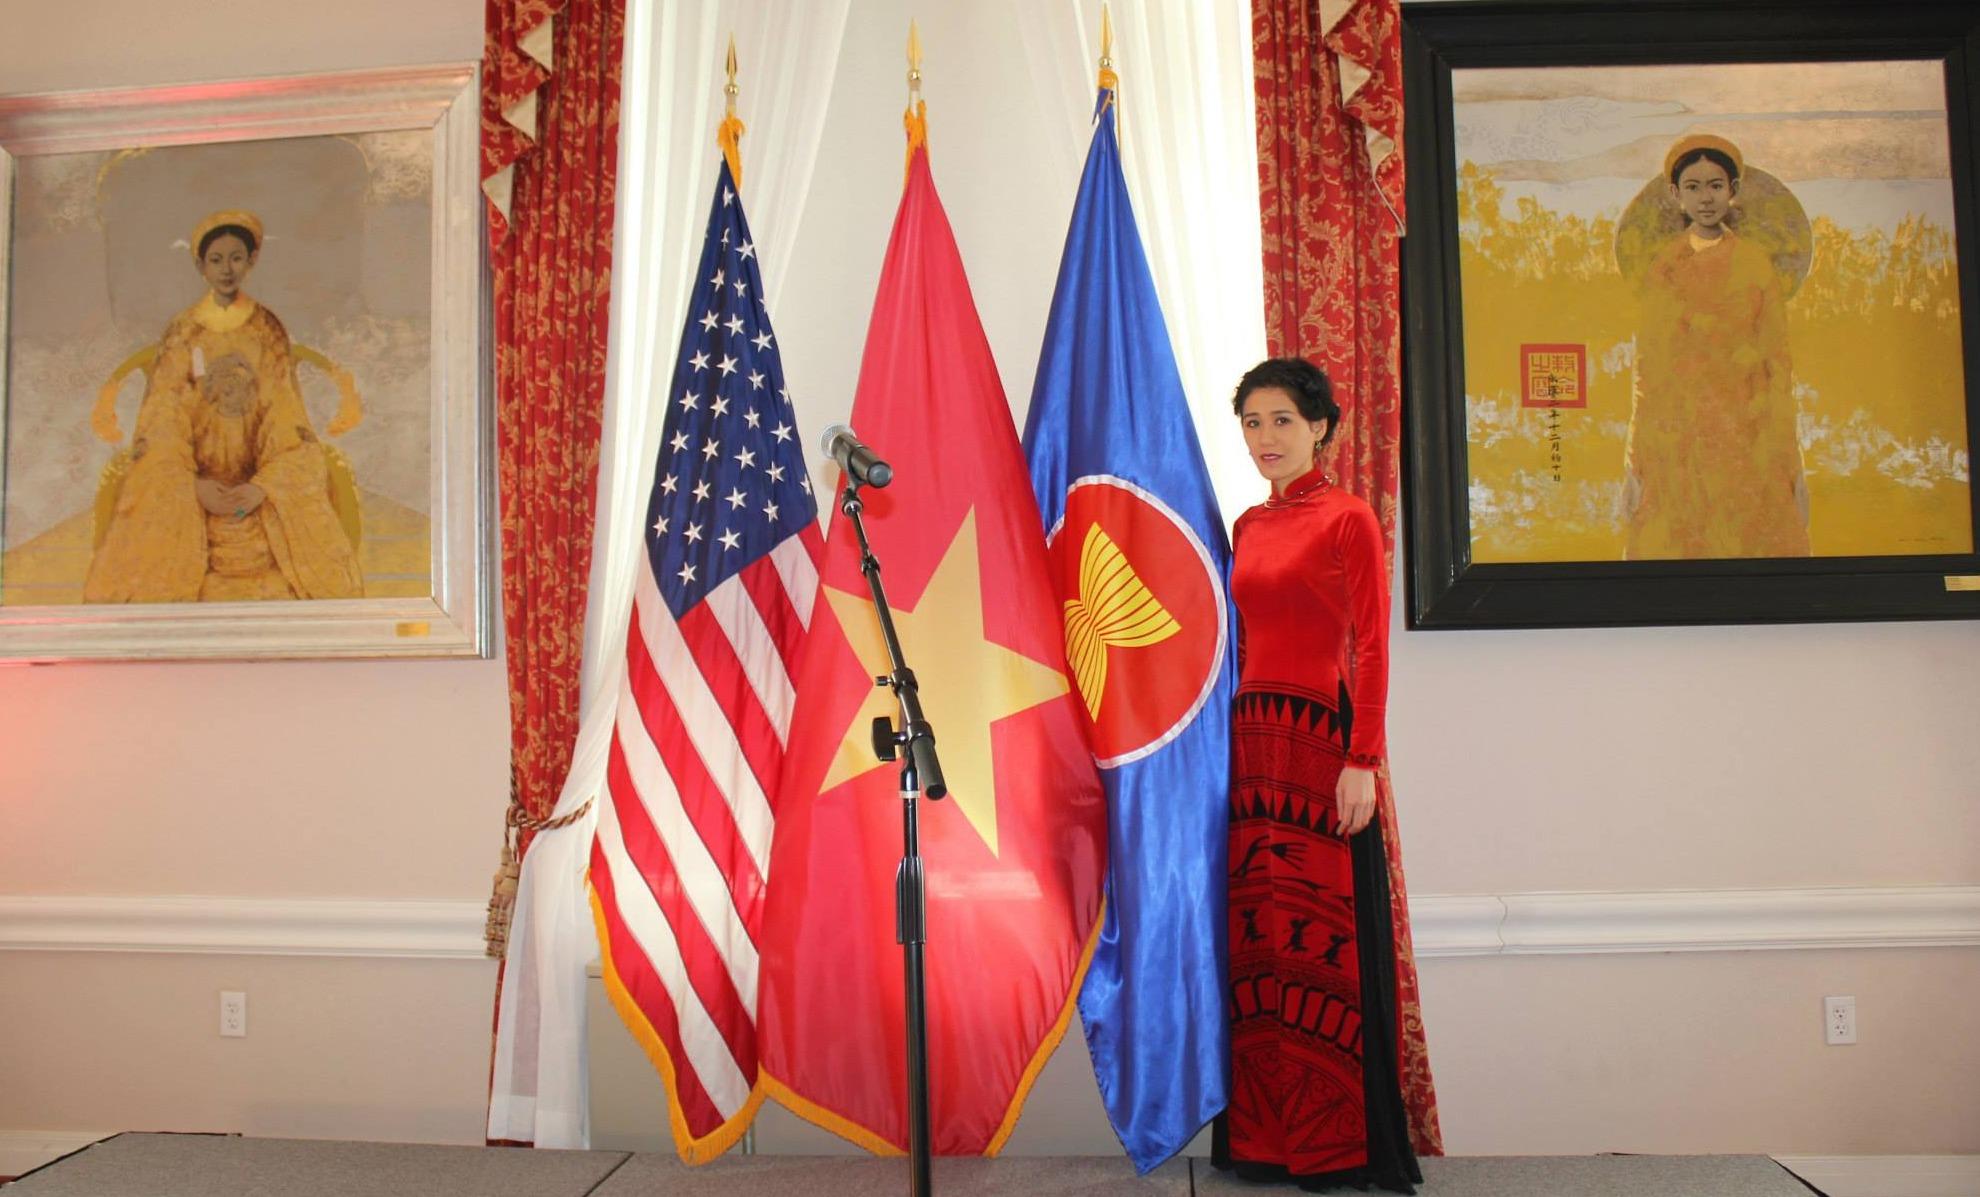 At Embassy of Vietnam in the U.S.